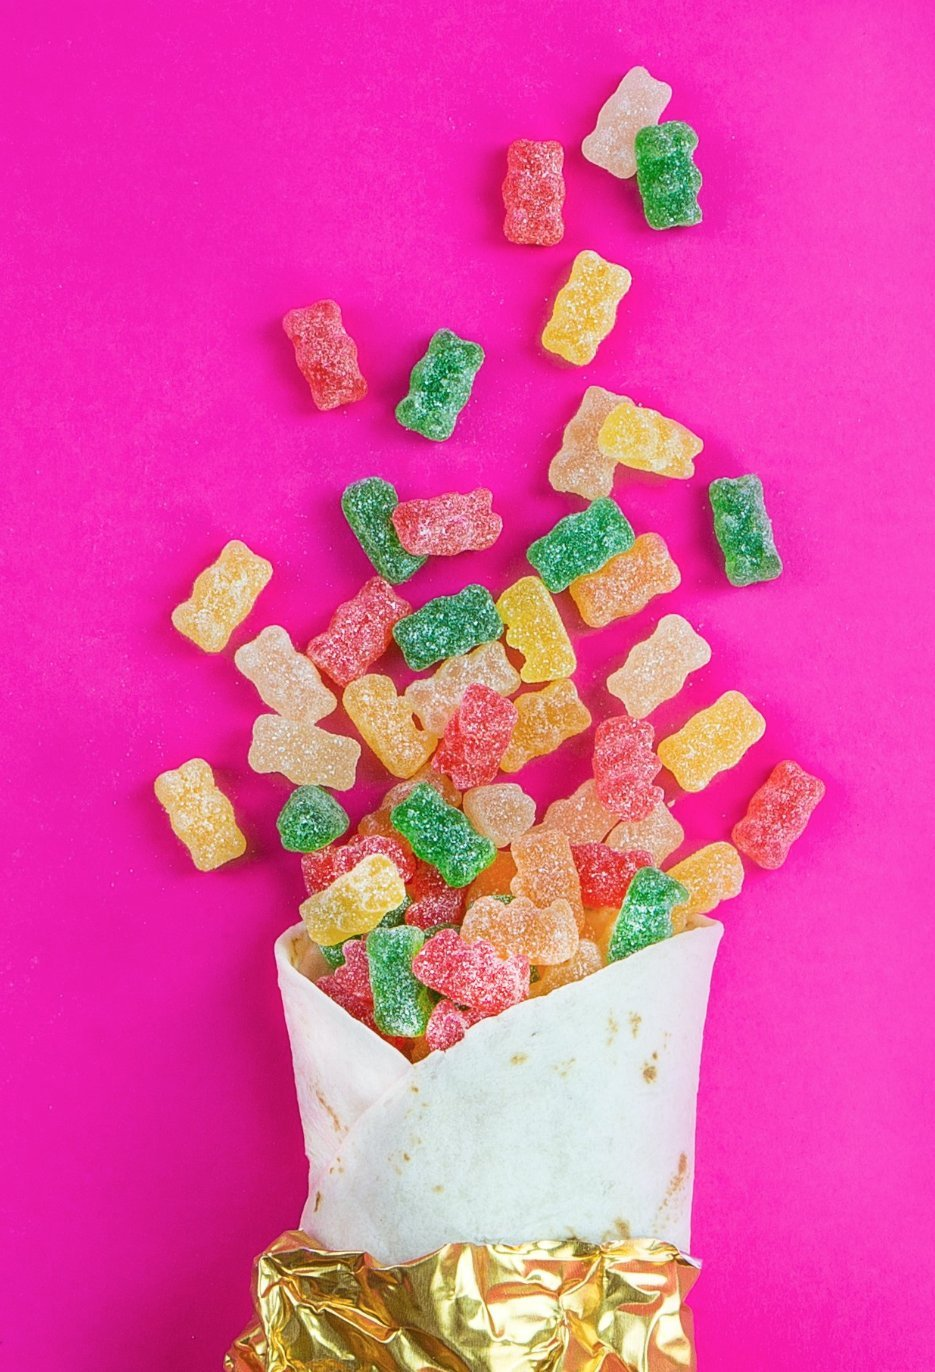 Haribo Gummi Candy, Goldbears Gummi Candy, Sour, 4.5 oz. Bag (Pack of 12) by Haribo (Image #5)